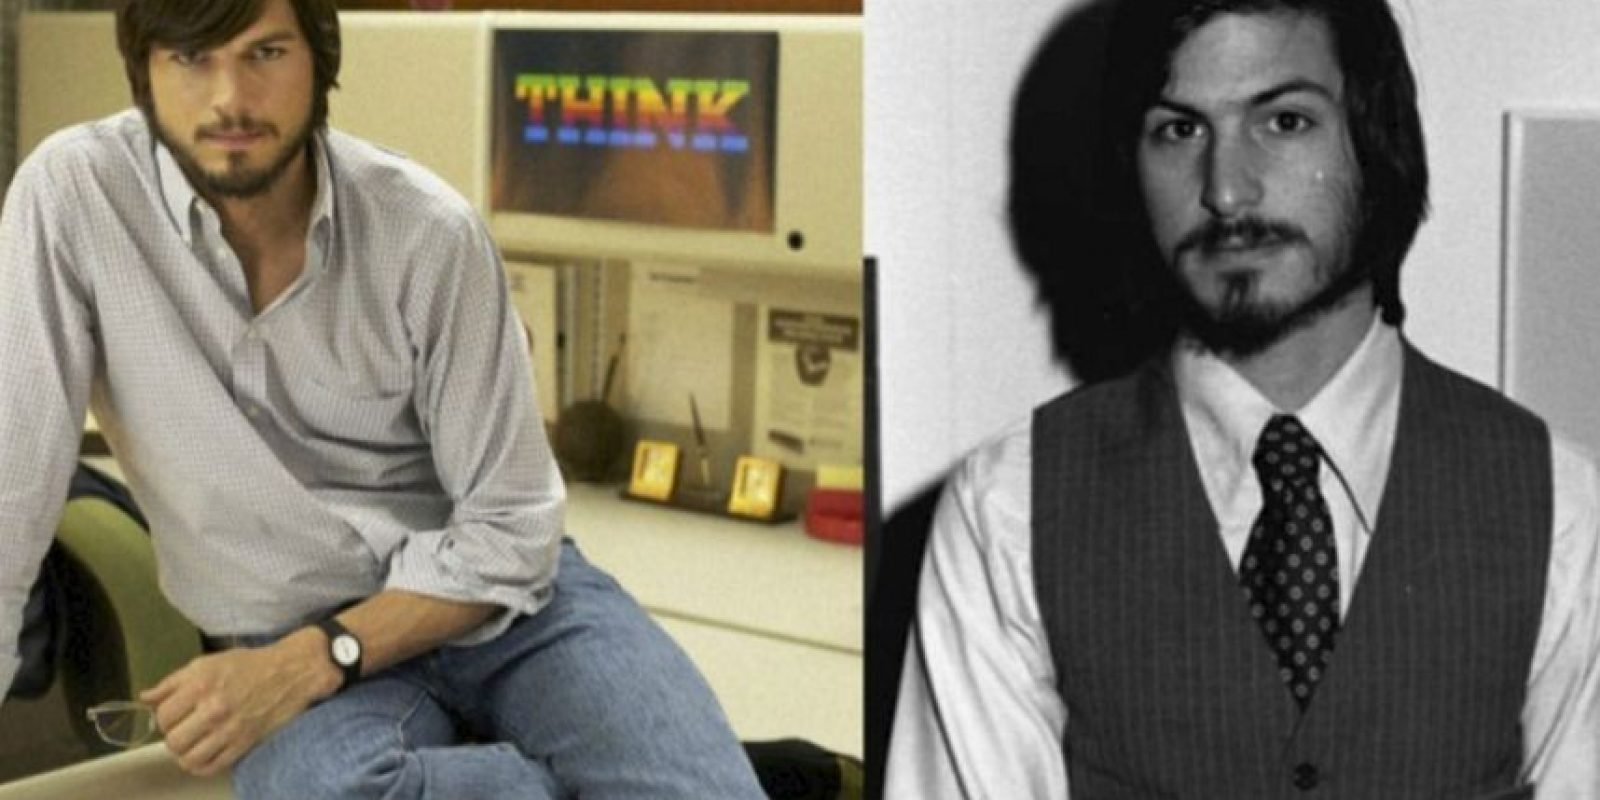 Ashton Kutcher-Steve Jobs Foto:imgur.com. Imagen Por: